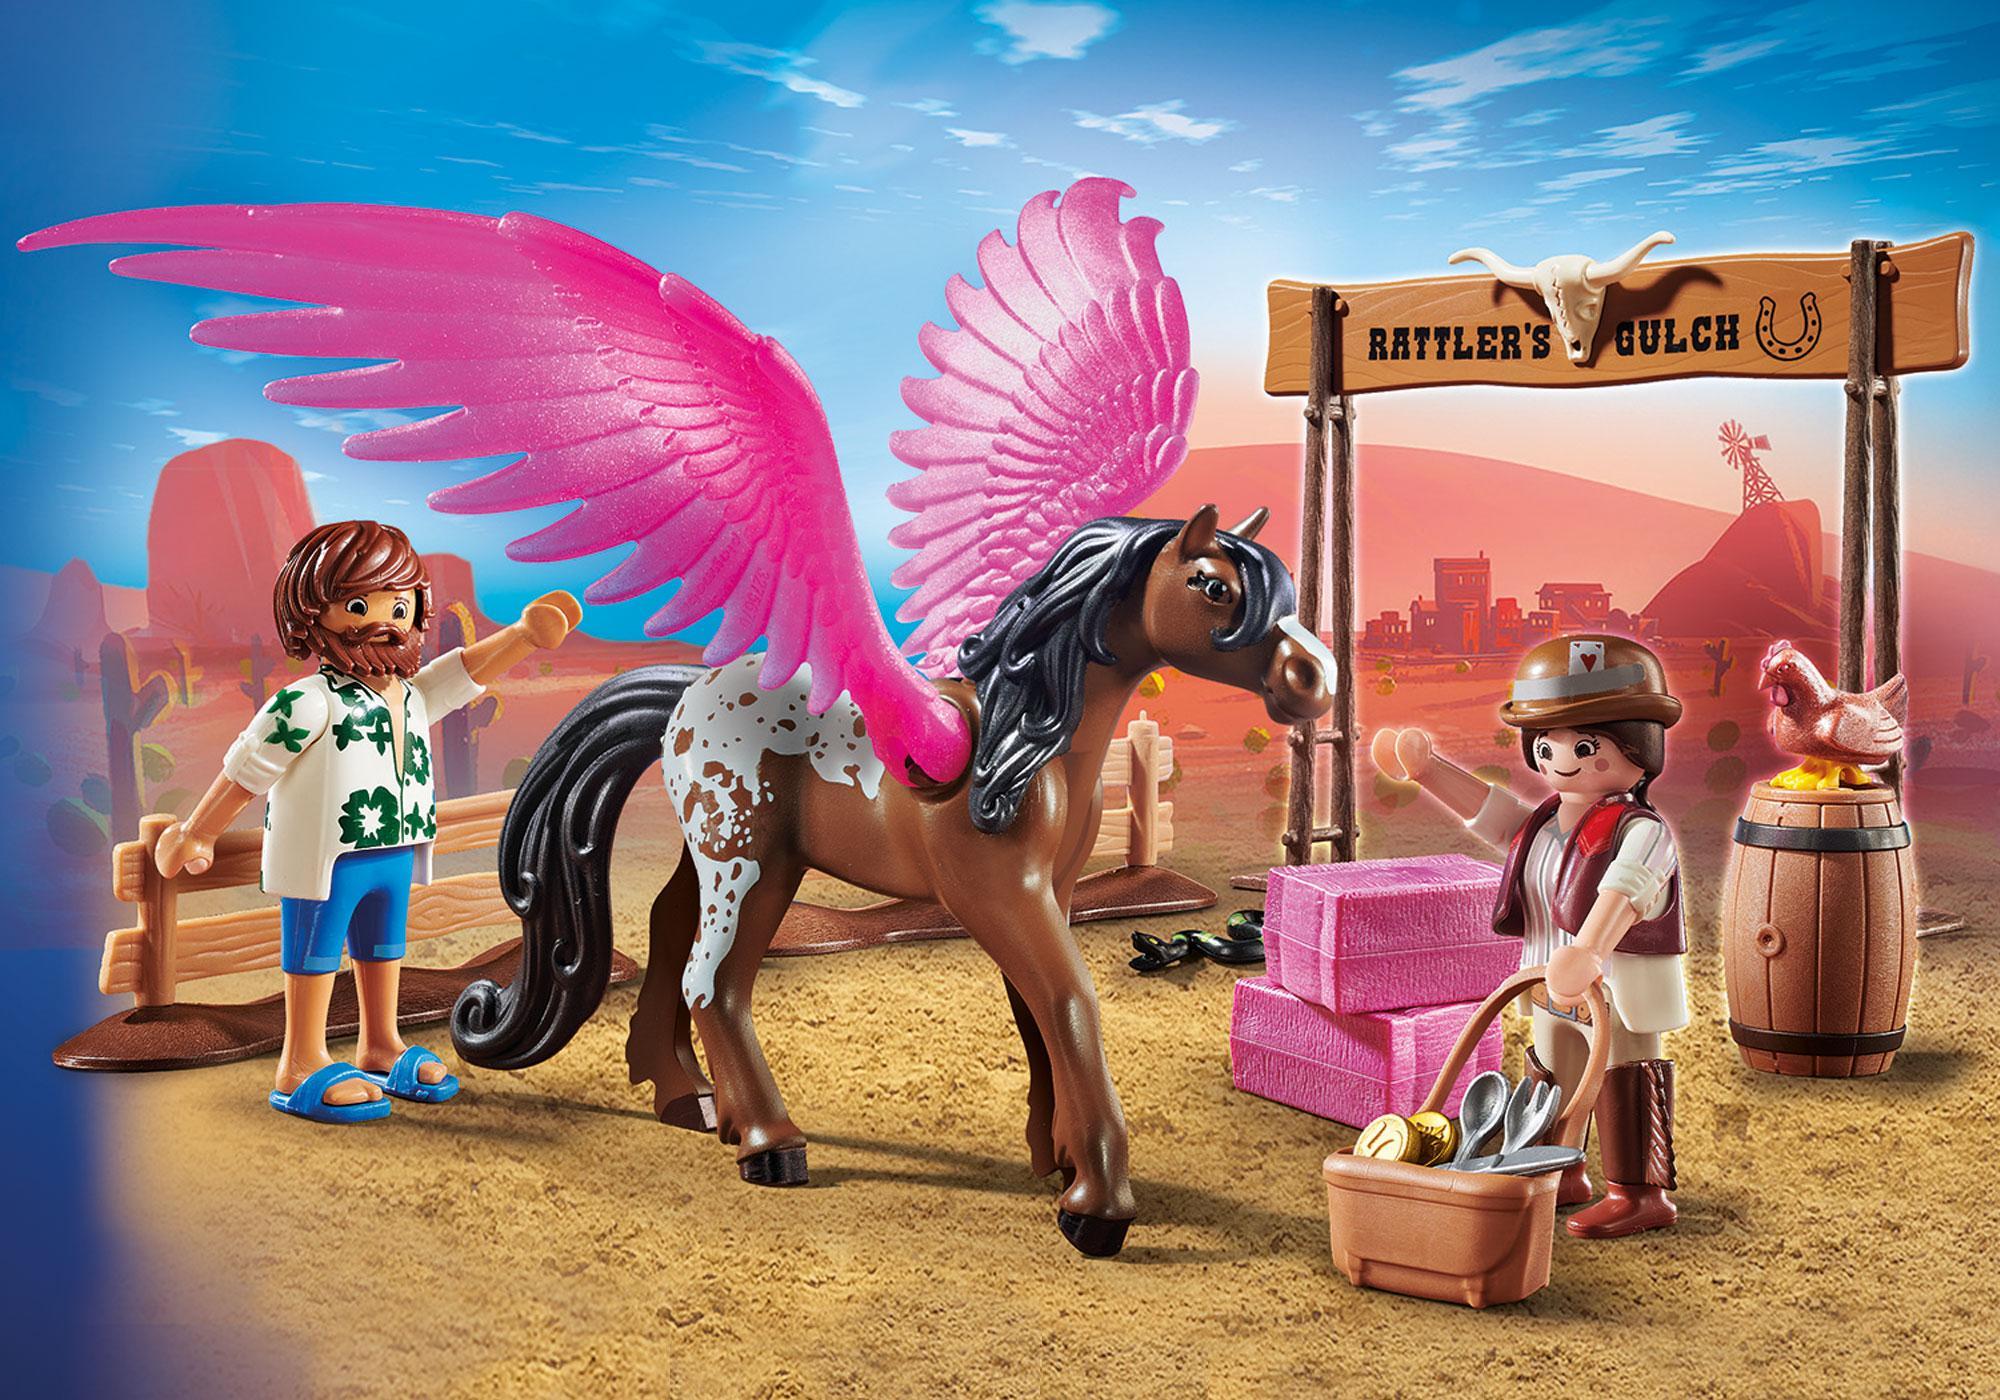 http://media.playmobil.com/i/playmobil/70074_product_detail/PLAYMOBIL: THE MOVIE Marla en Del met gevleugeld paard